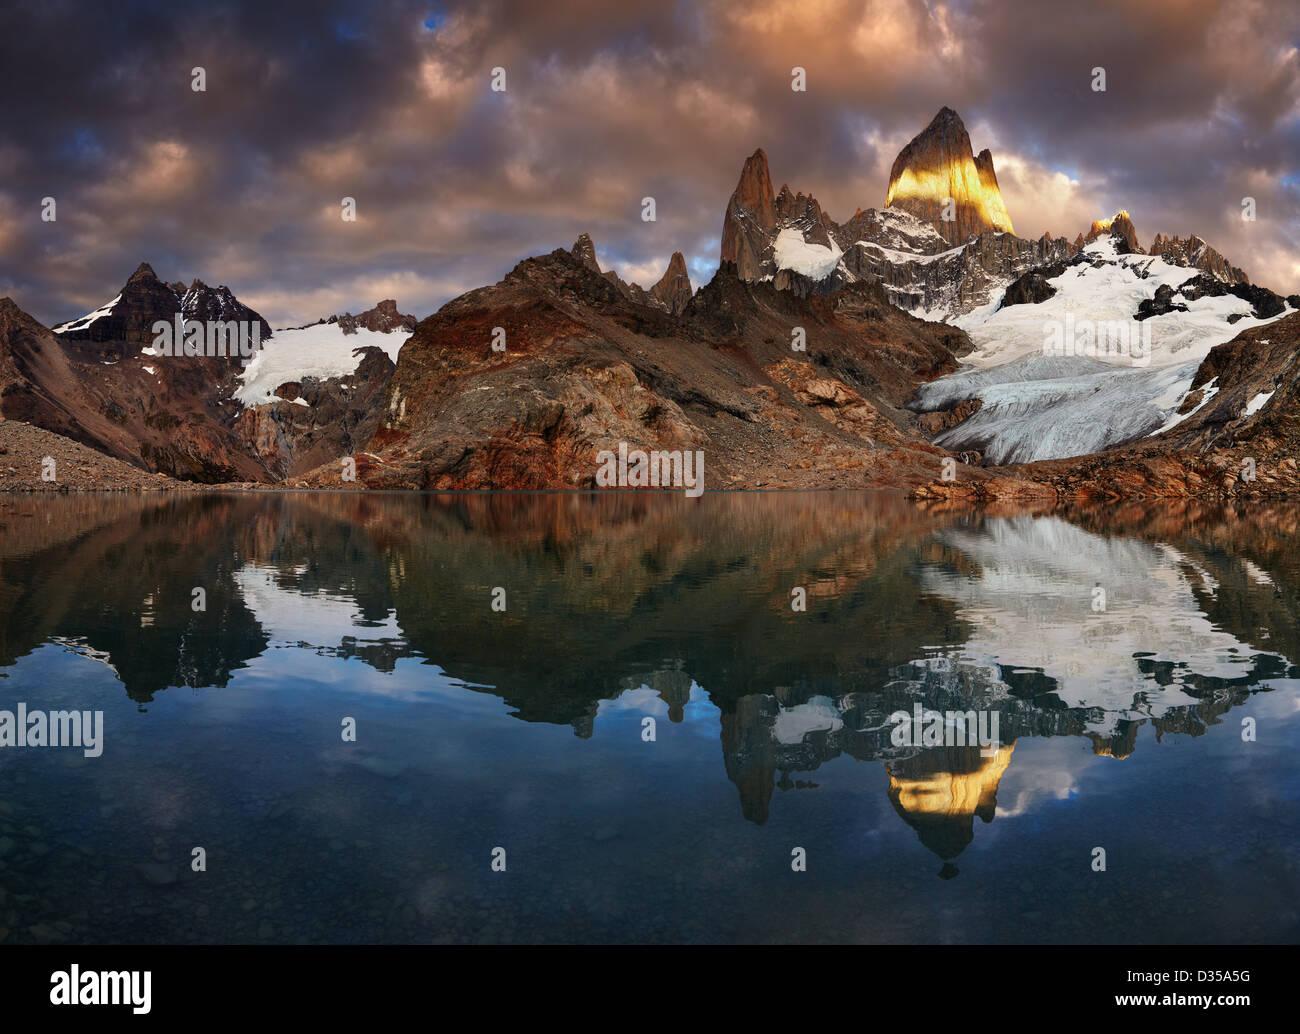 Laguna de Los Tres and mount Fitz Roy at sunrise, Patagonia, Argentina - Stock Image